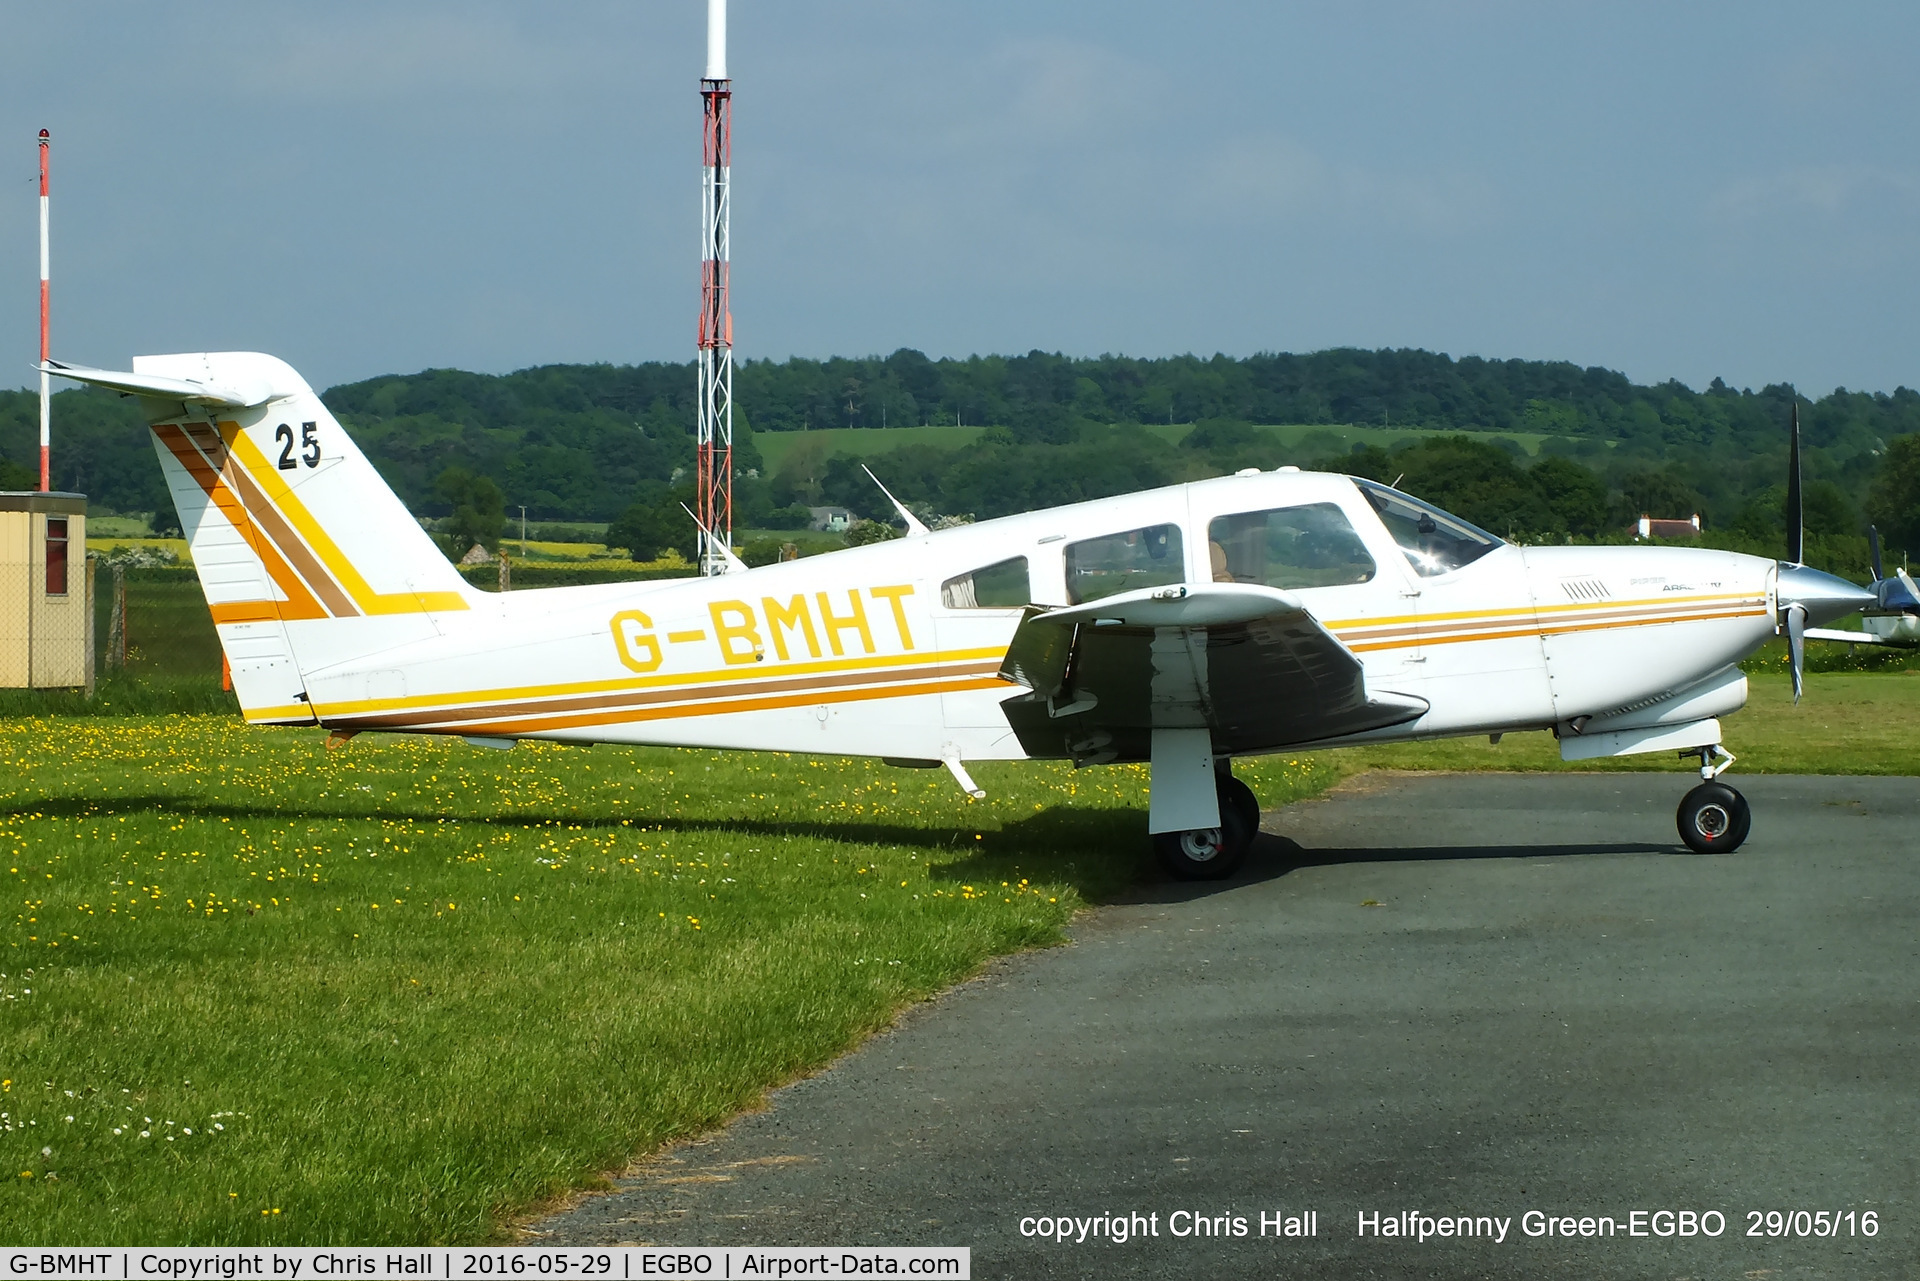 G-BMHT, 1981 Piper PA-28RT-201T Turbo Arrow IV C/N 28R-8231010, at Halfpenny Green